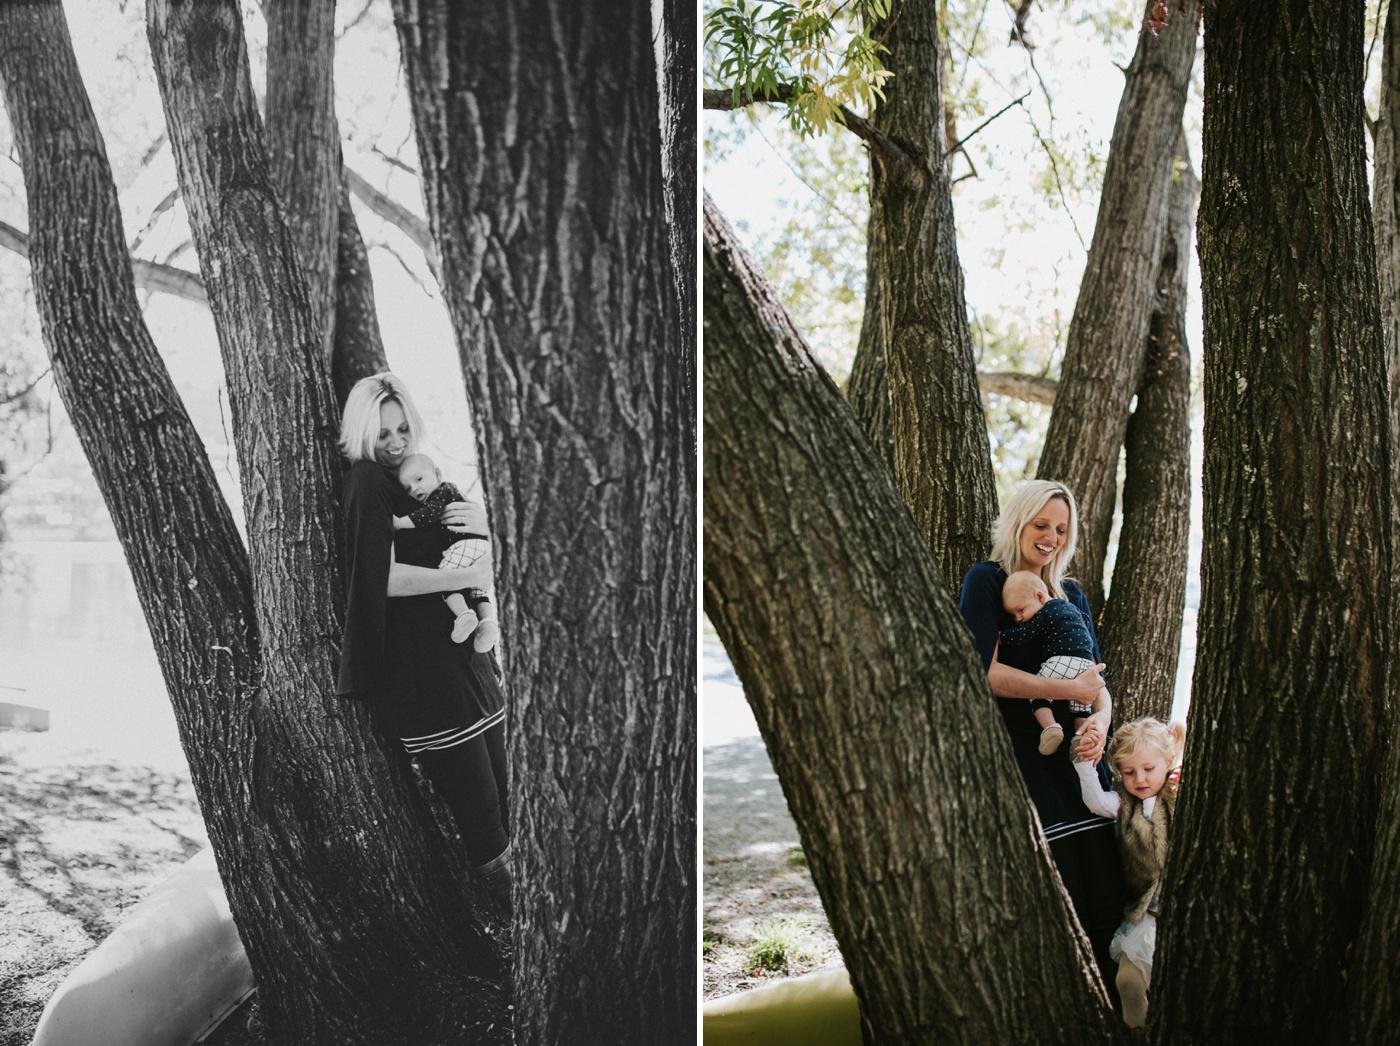 Blake-Lily-Rolig-Lekfull-Familjesession-Familjefotograf-Stockholm-Orebro_35